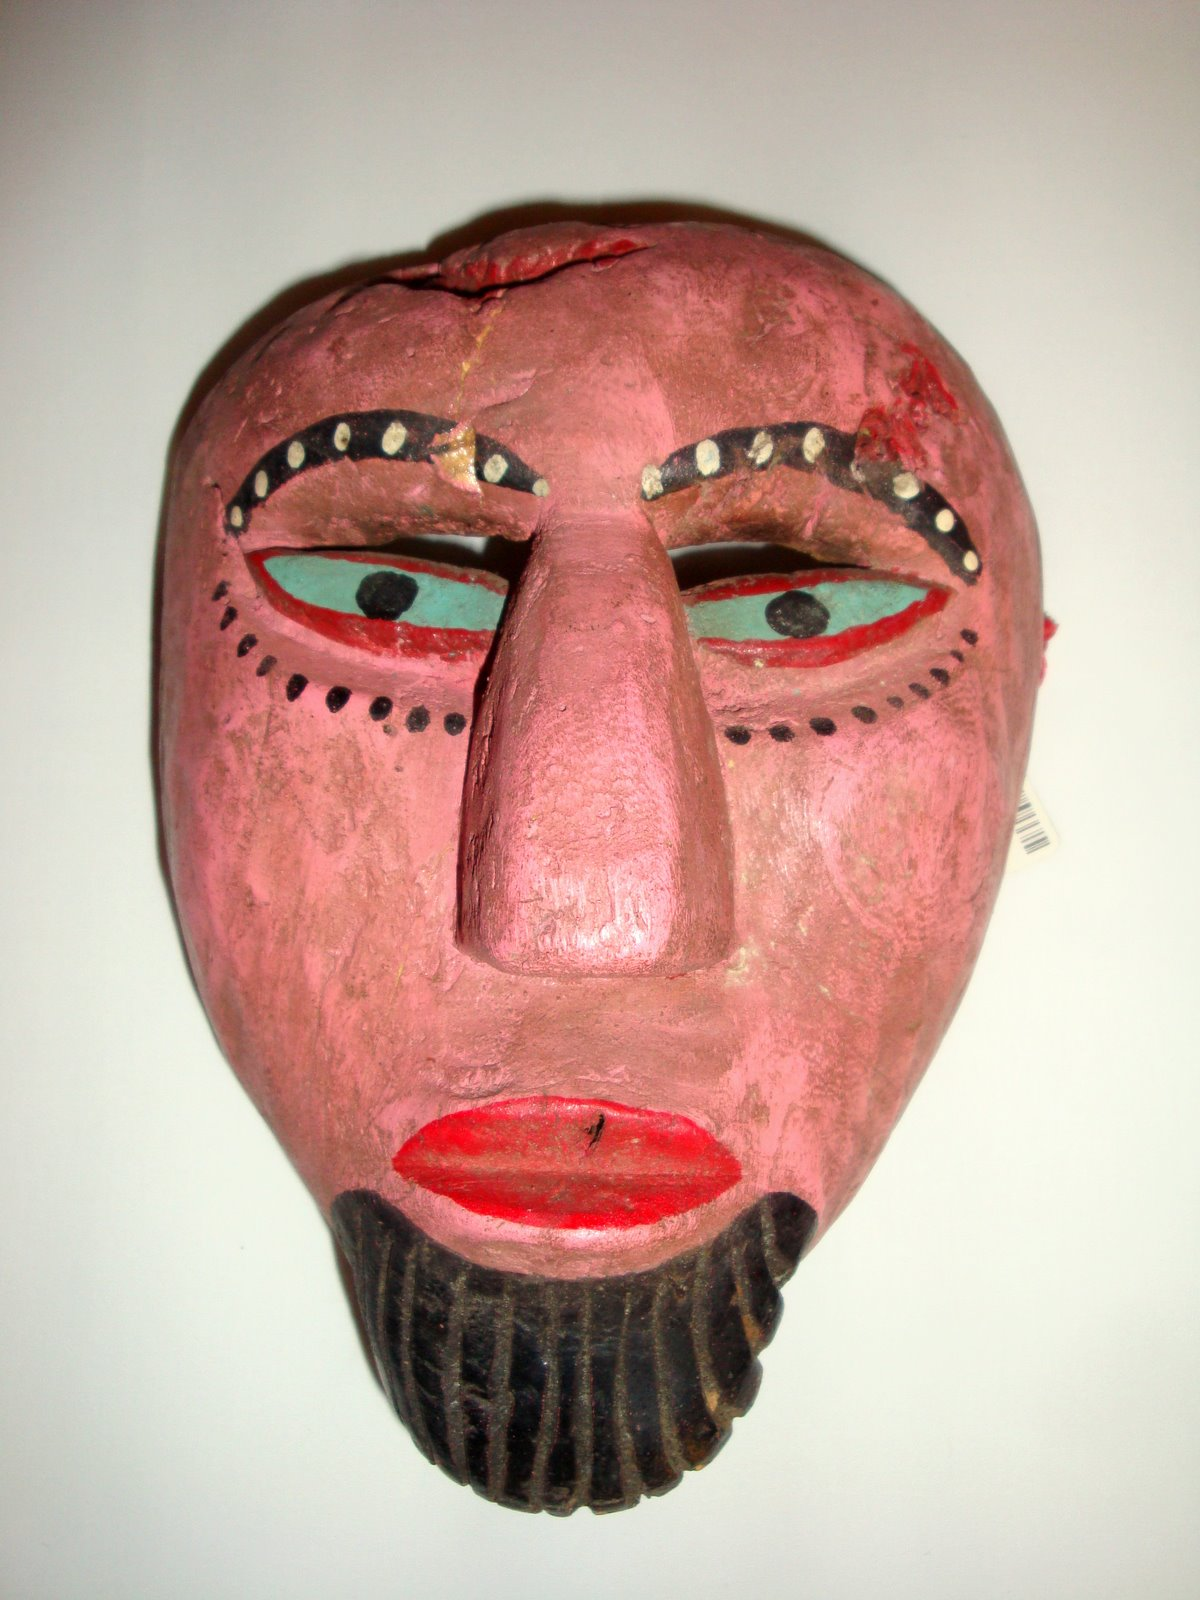 Mascaras latinoamericanas: julio 2010